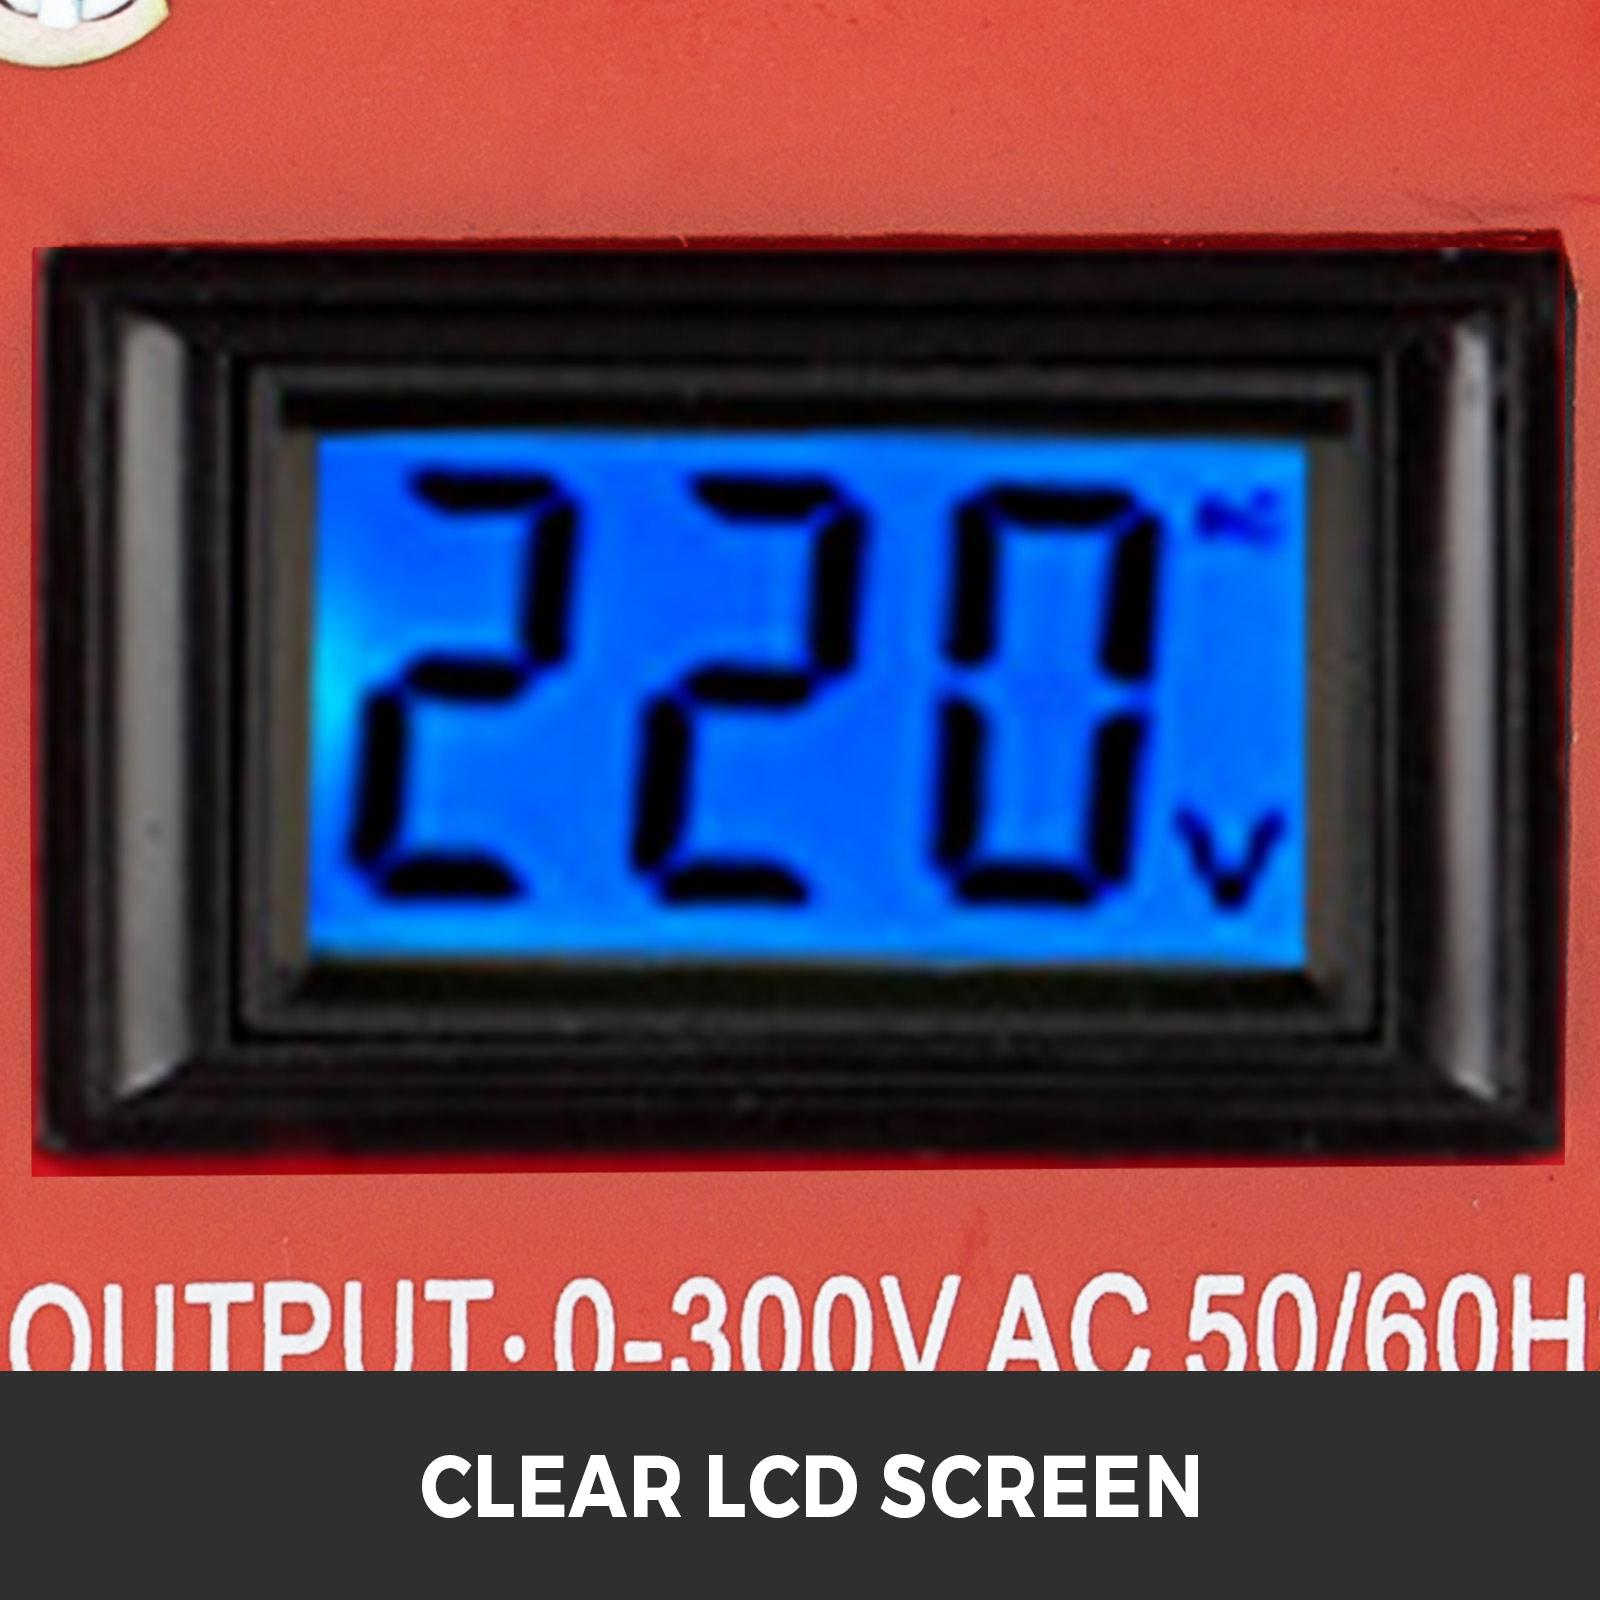 Auto-Variac-Variable-Transformer-0-5-1-2-3KVA-Regulator-pure-copper-coil-220V thumbnail 52